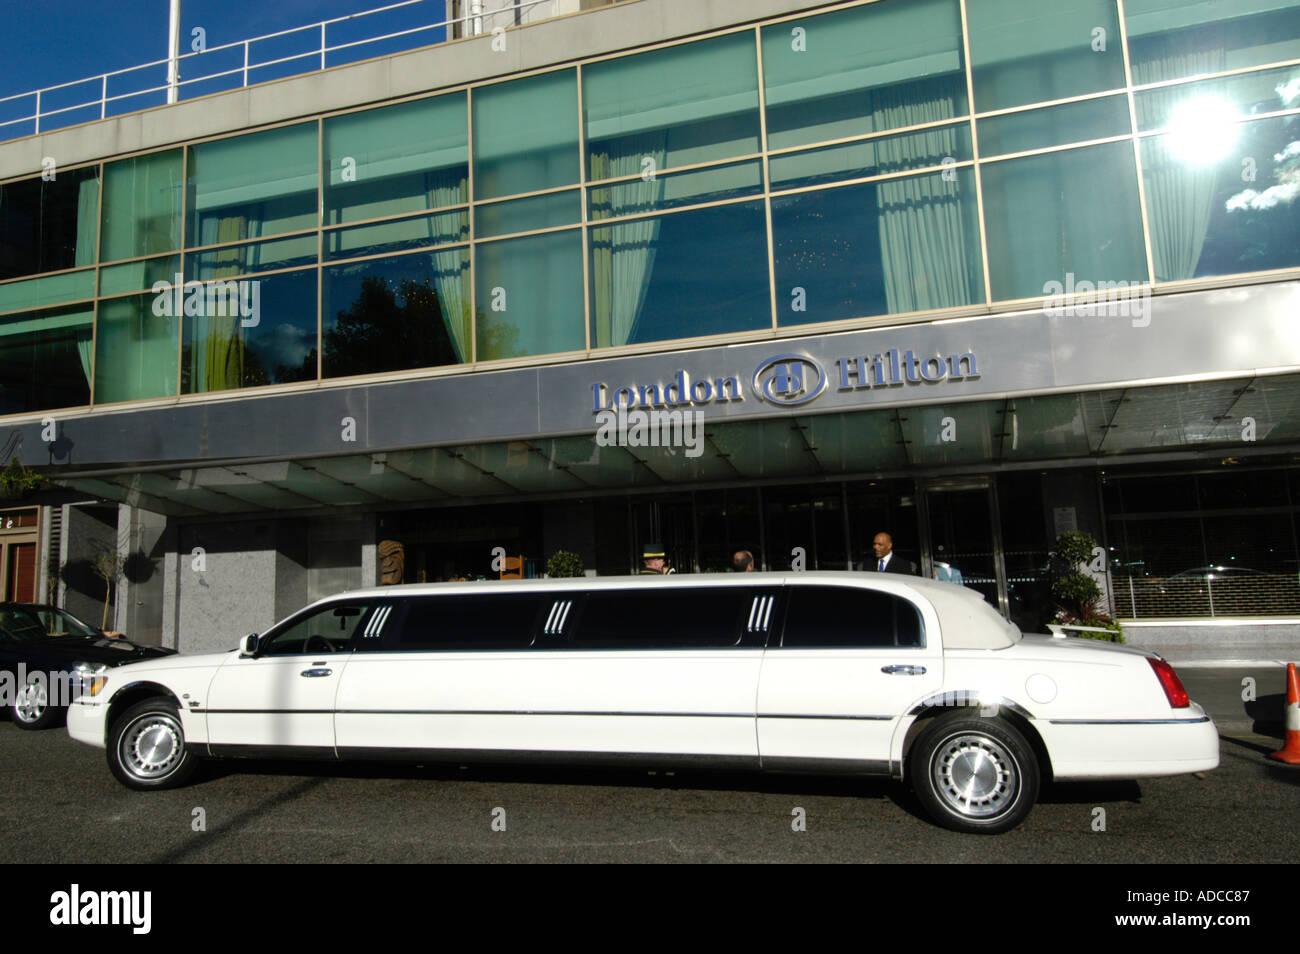 White stretch limousine at the London Hilton Hotel Mayfair England UK - Stock Image